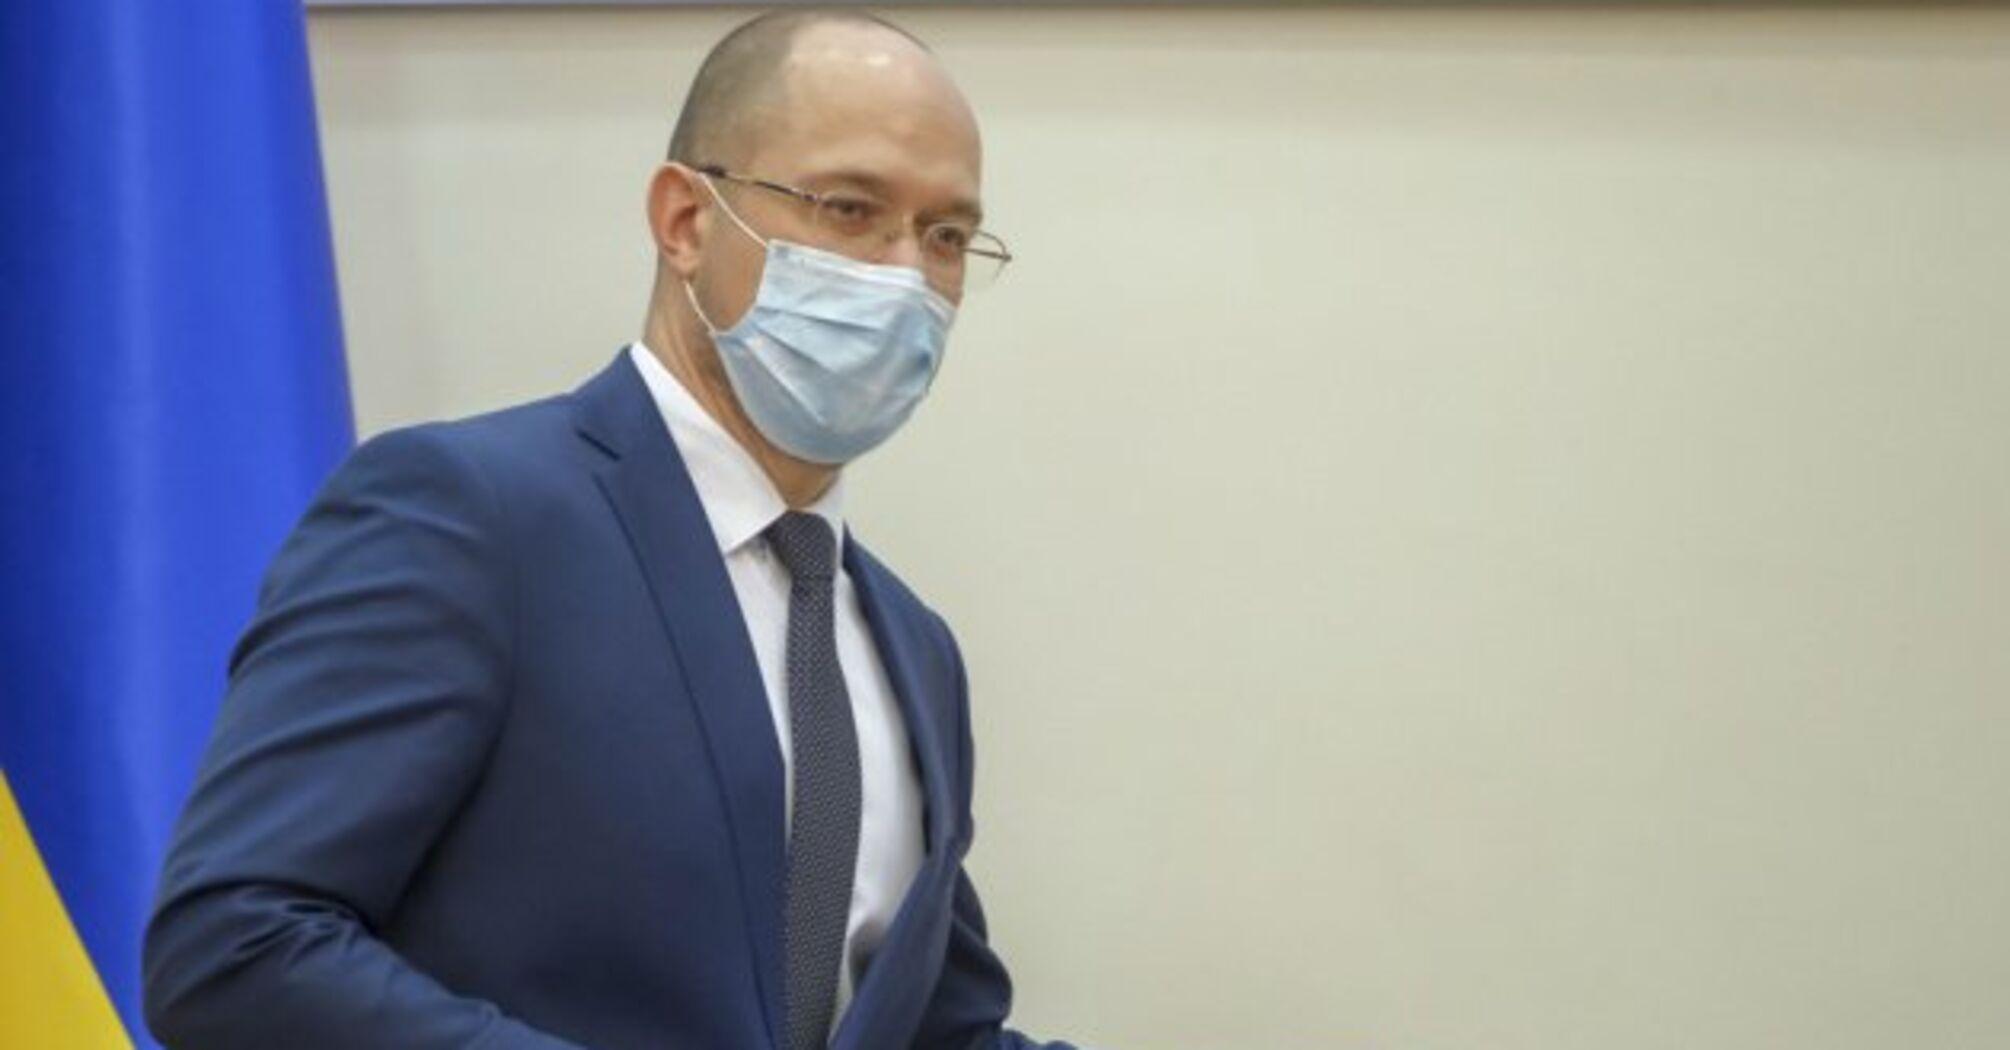 Украина перейдет на адаптивный карантин: Шмыгаль раскрыл план